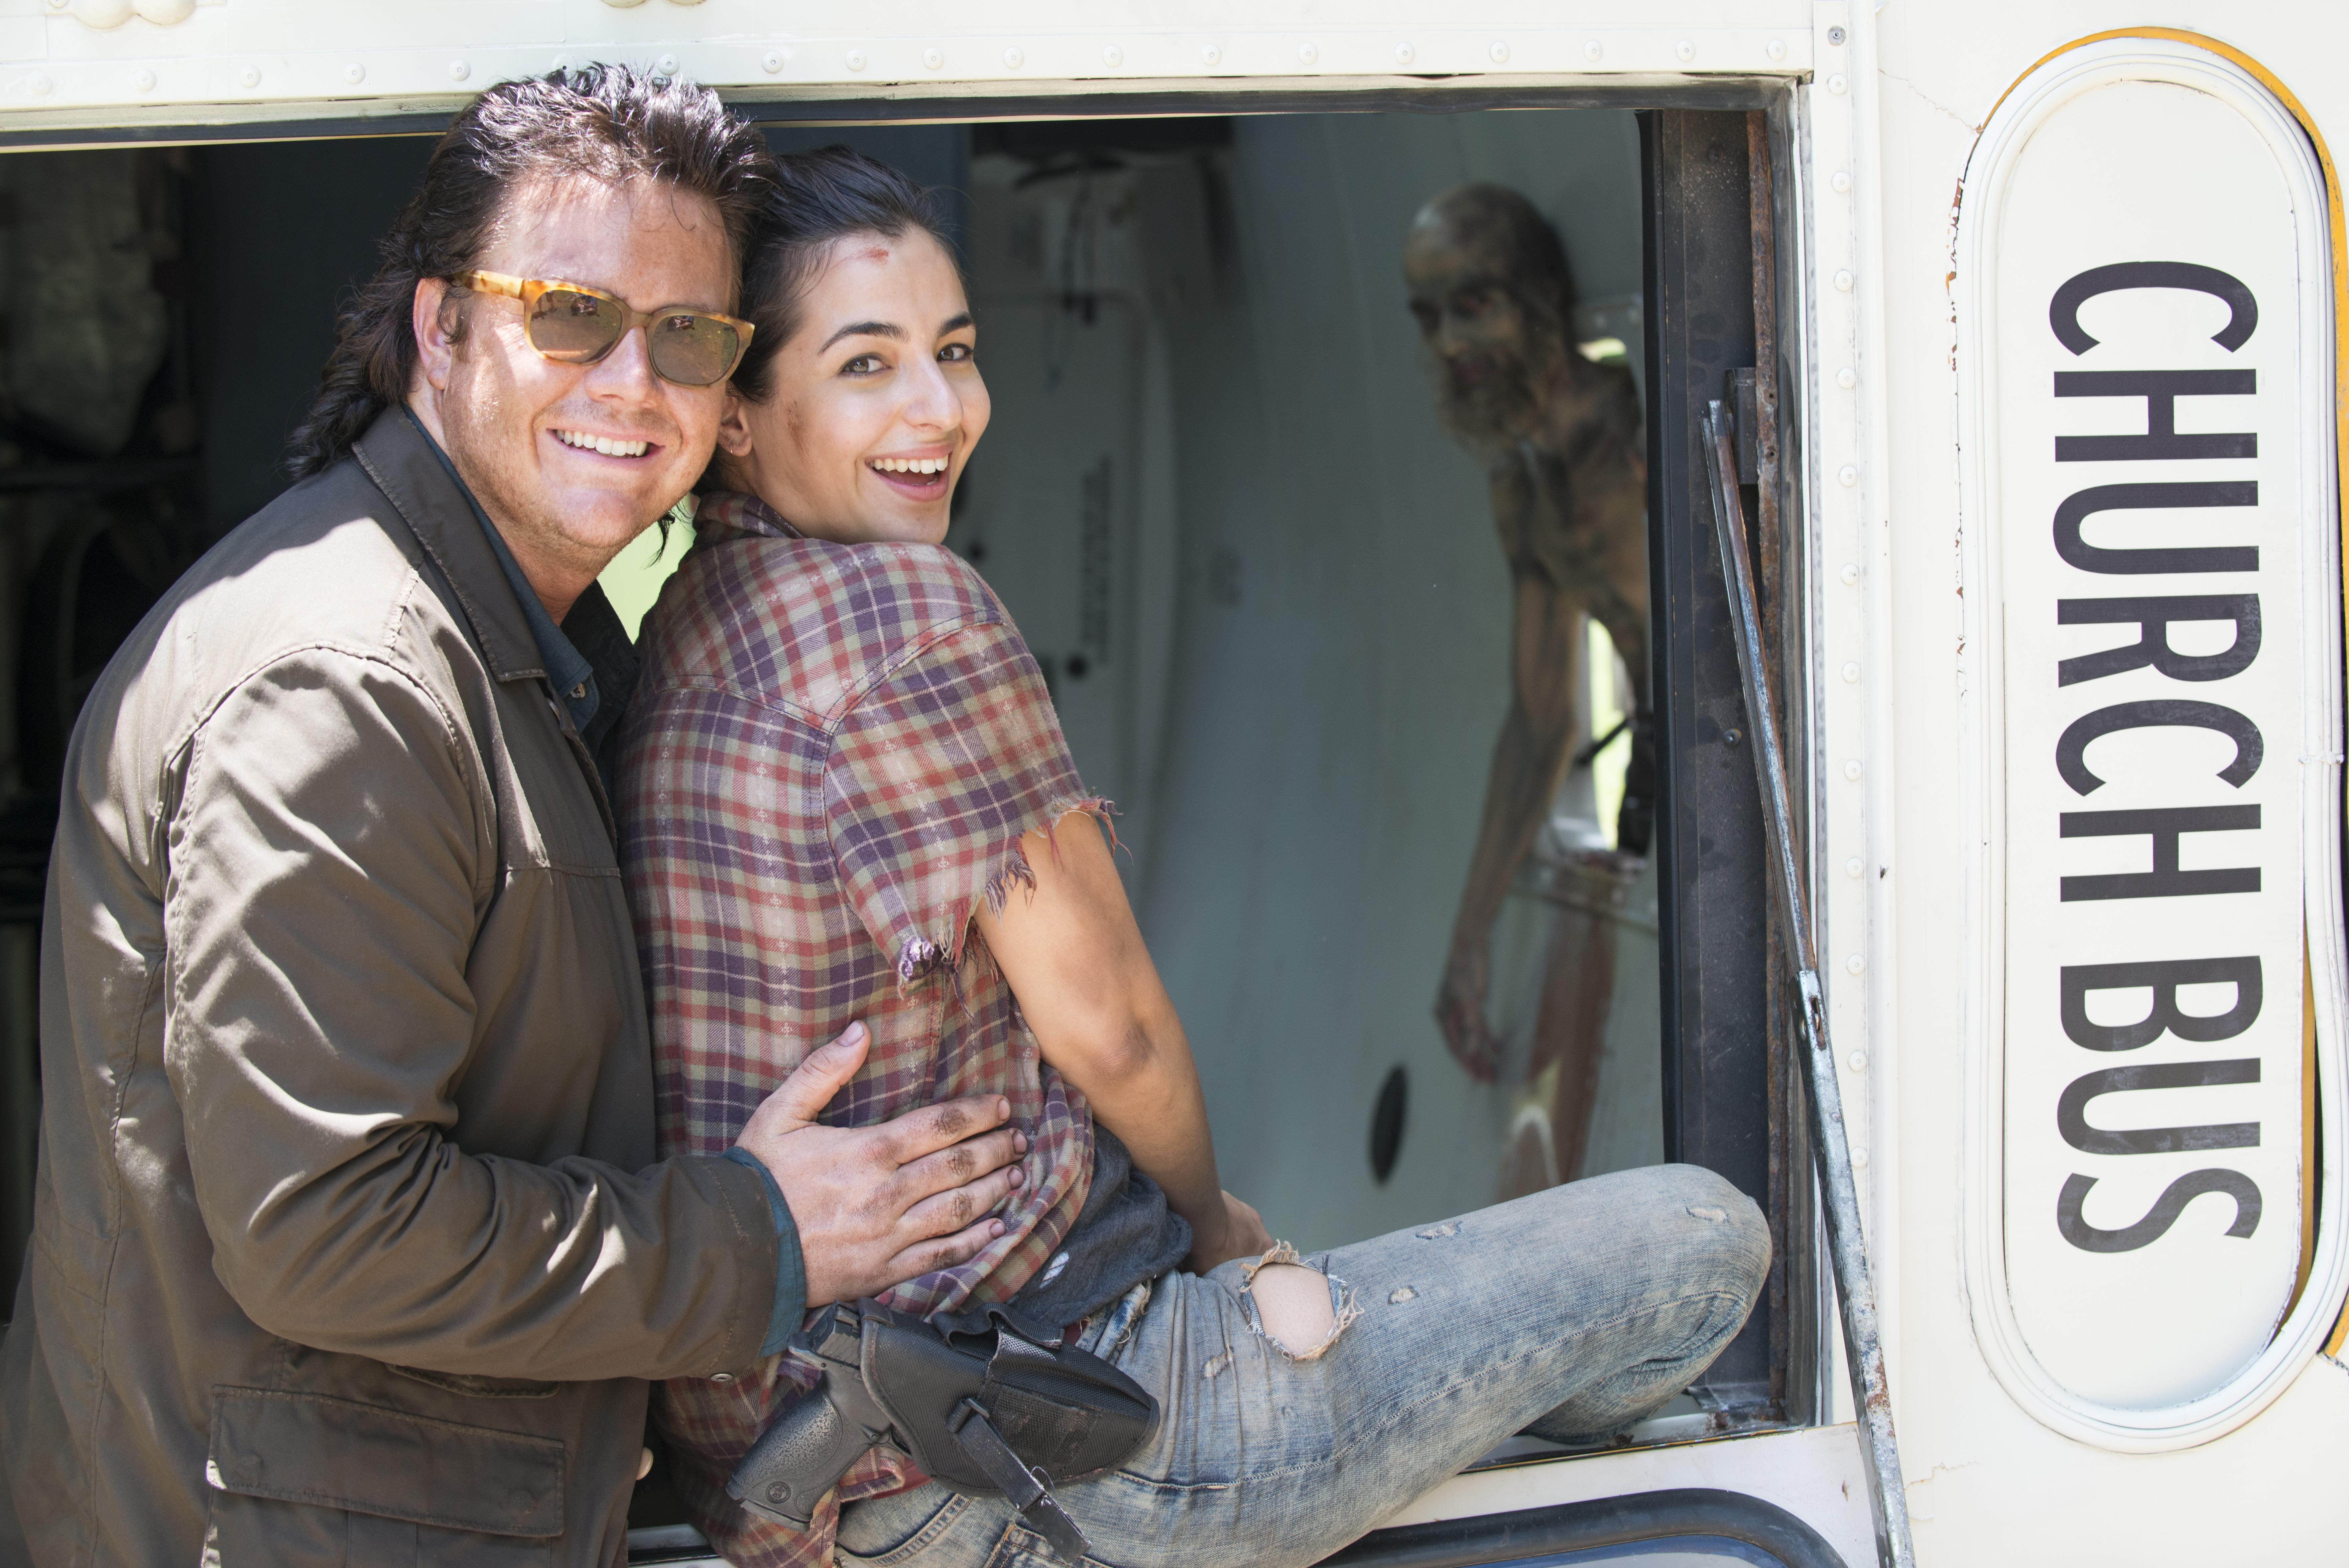 The Walking Dead Season 5 13 Behind The Scenes Stills